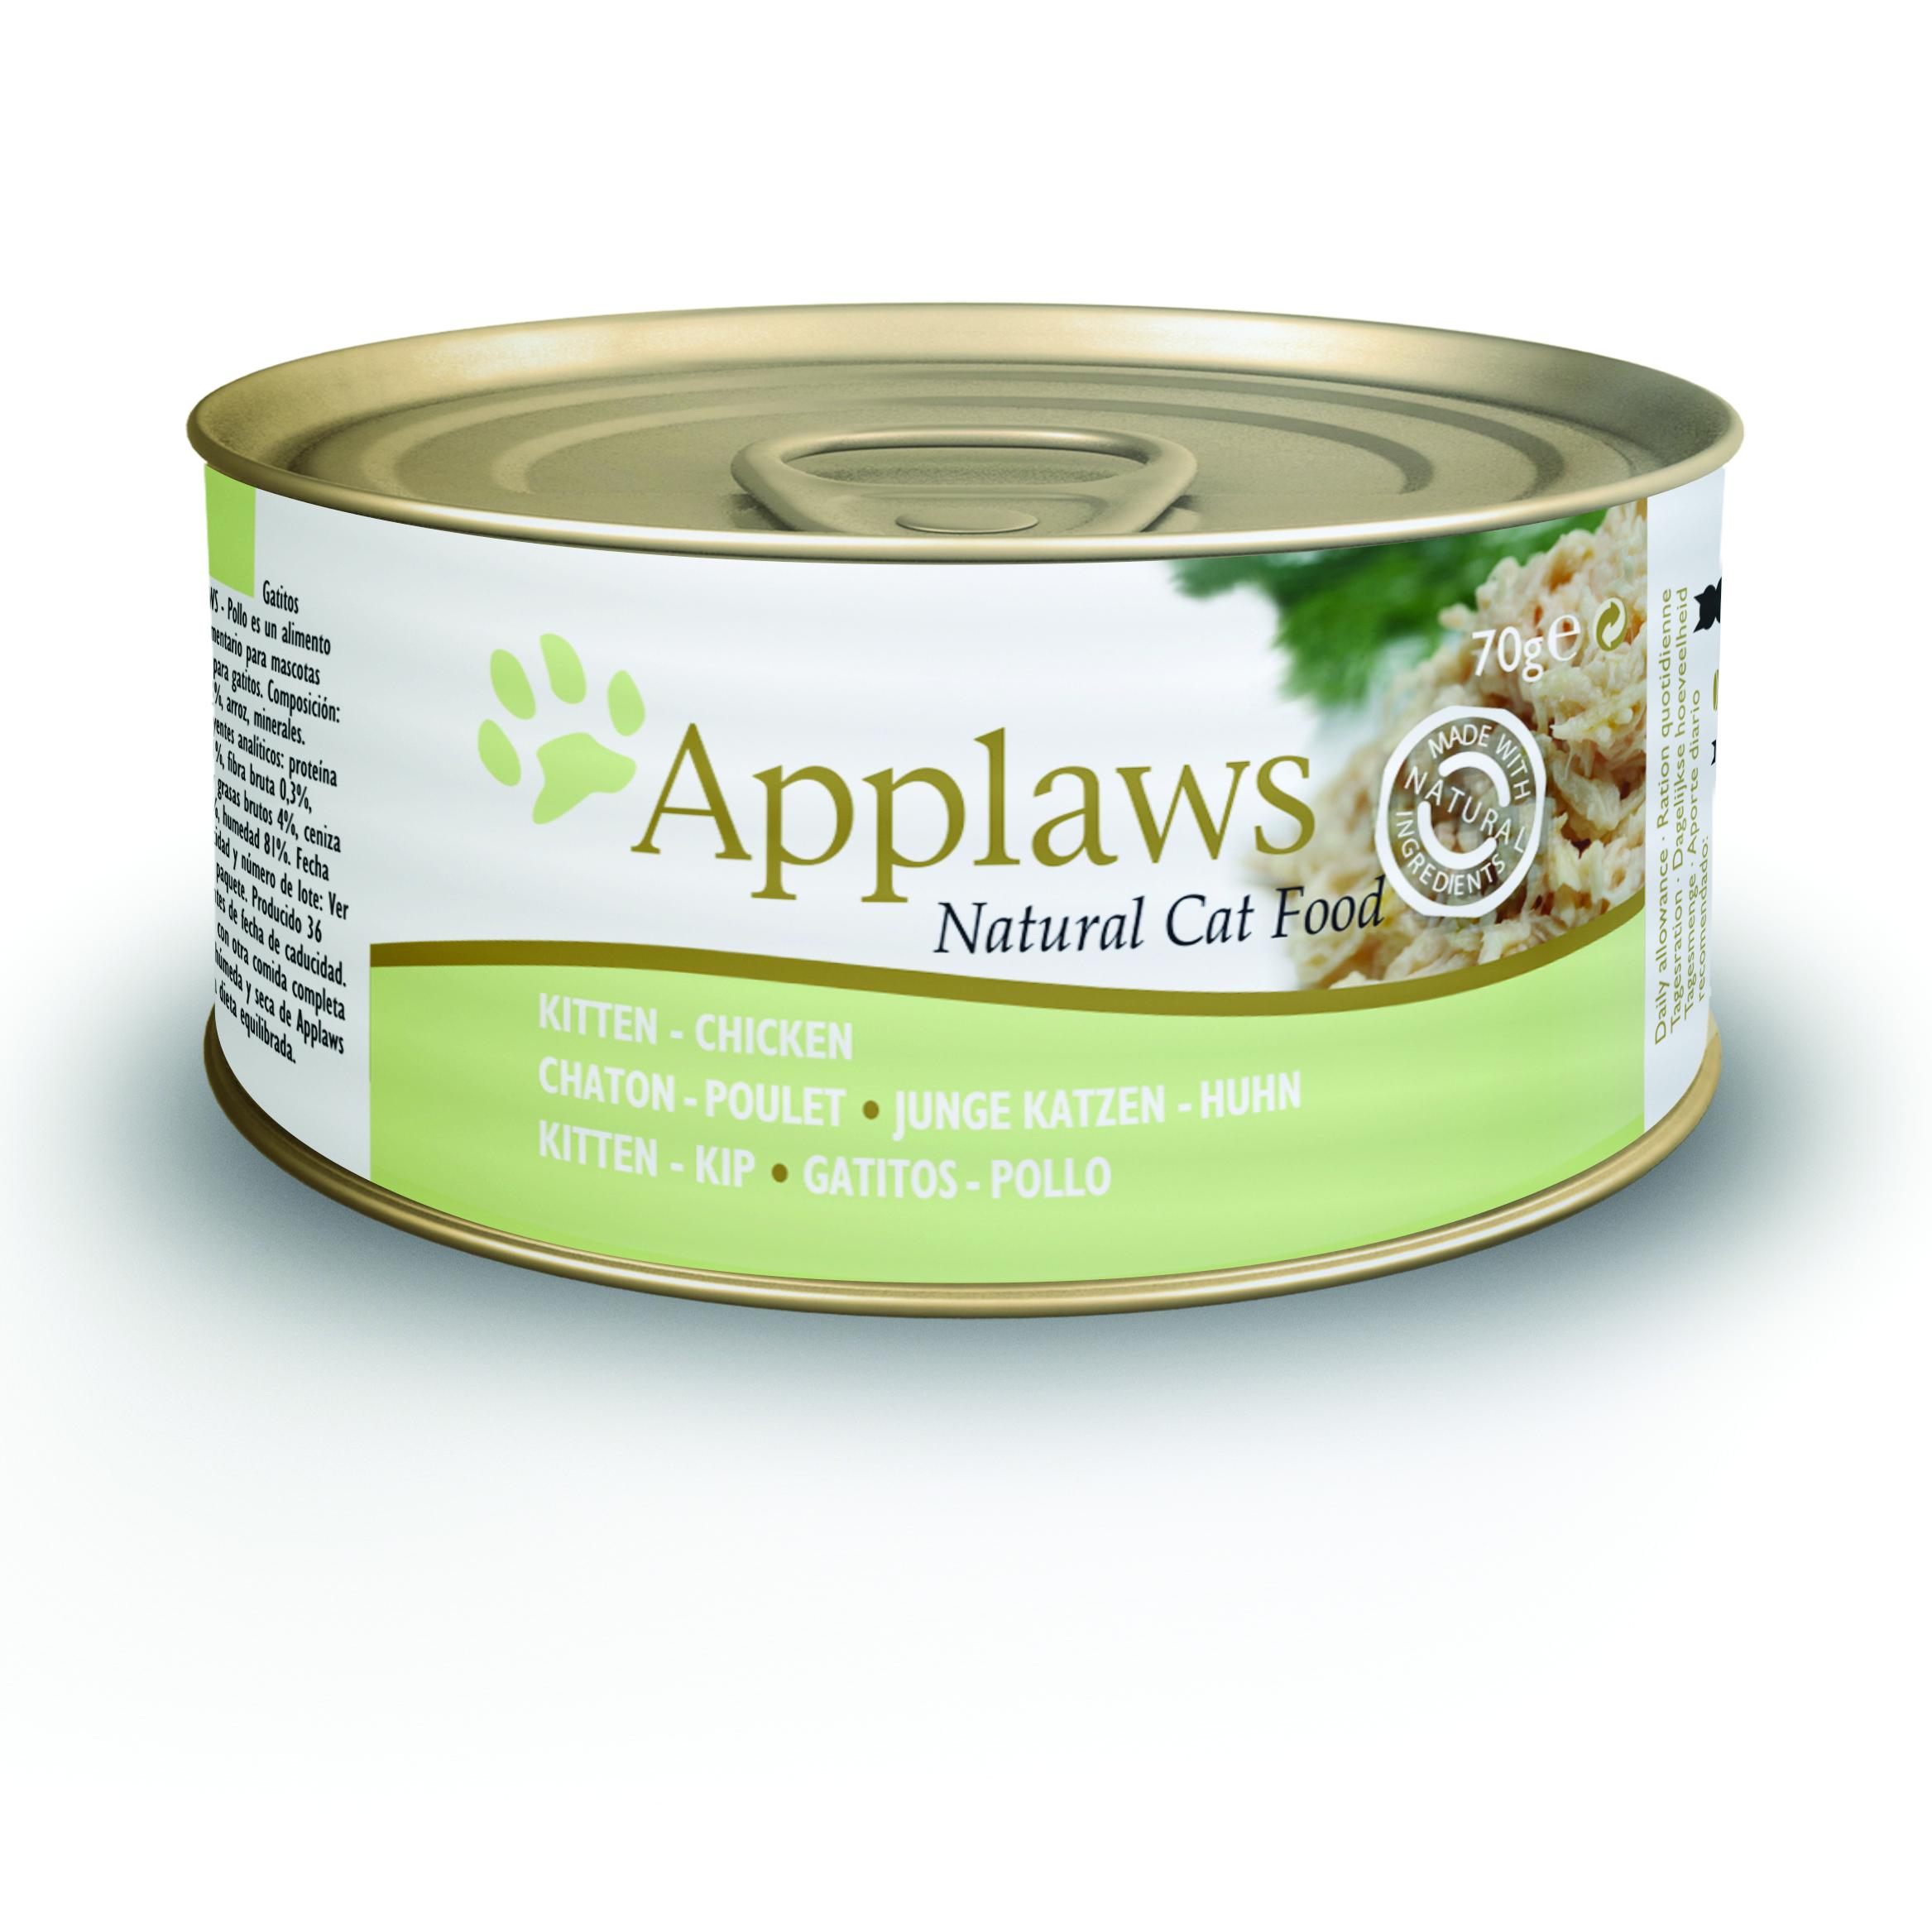 Latinha gato Applaws 70g - Galinha